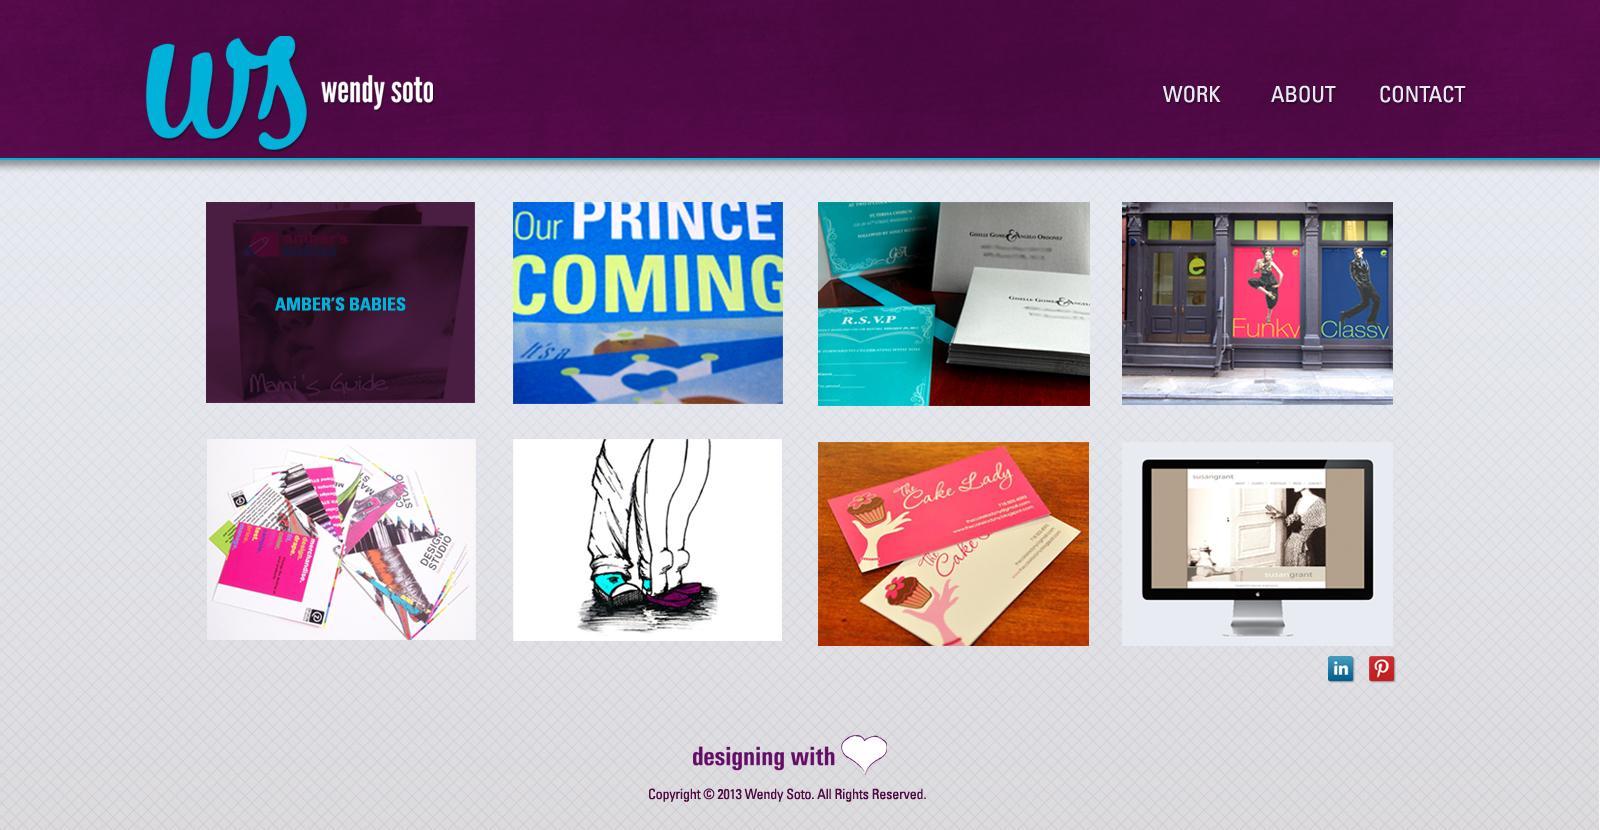 wsoto.com - image 3 - student project